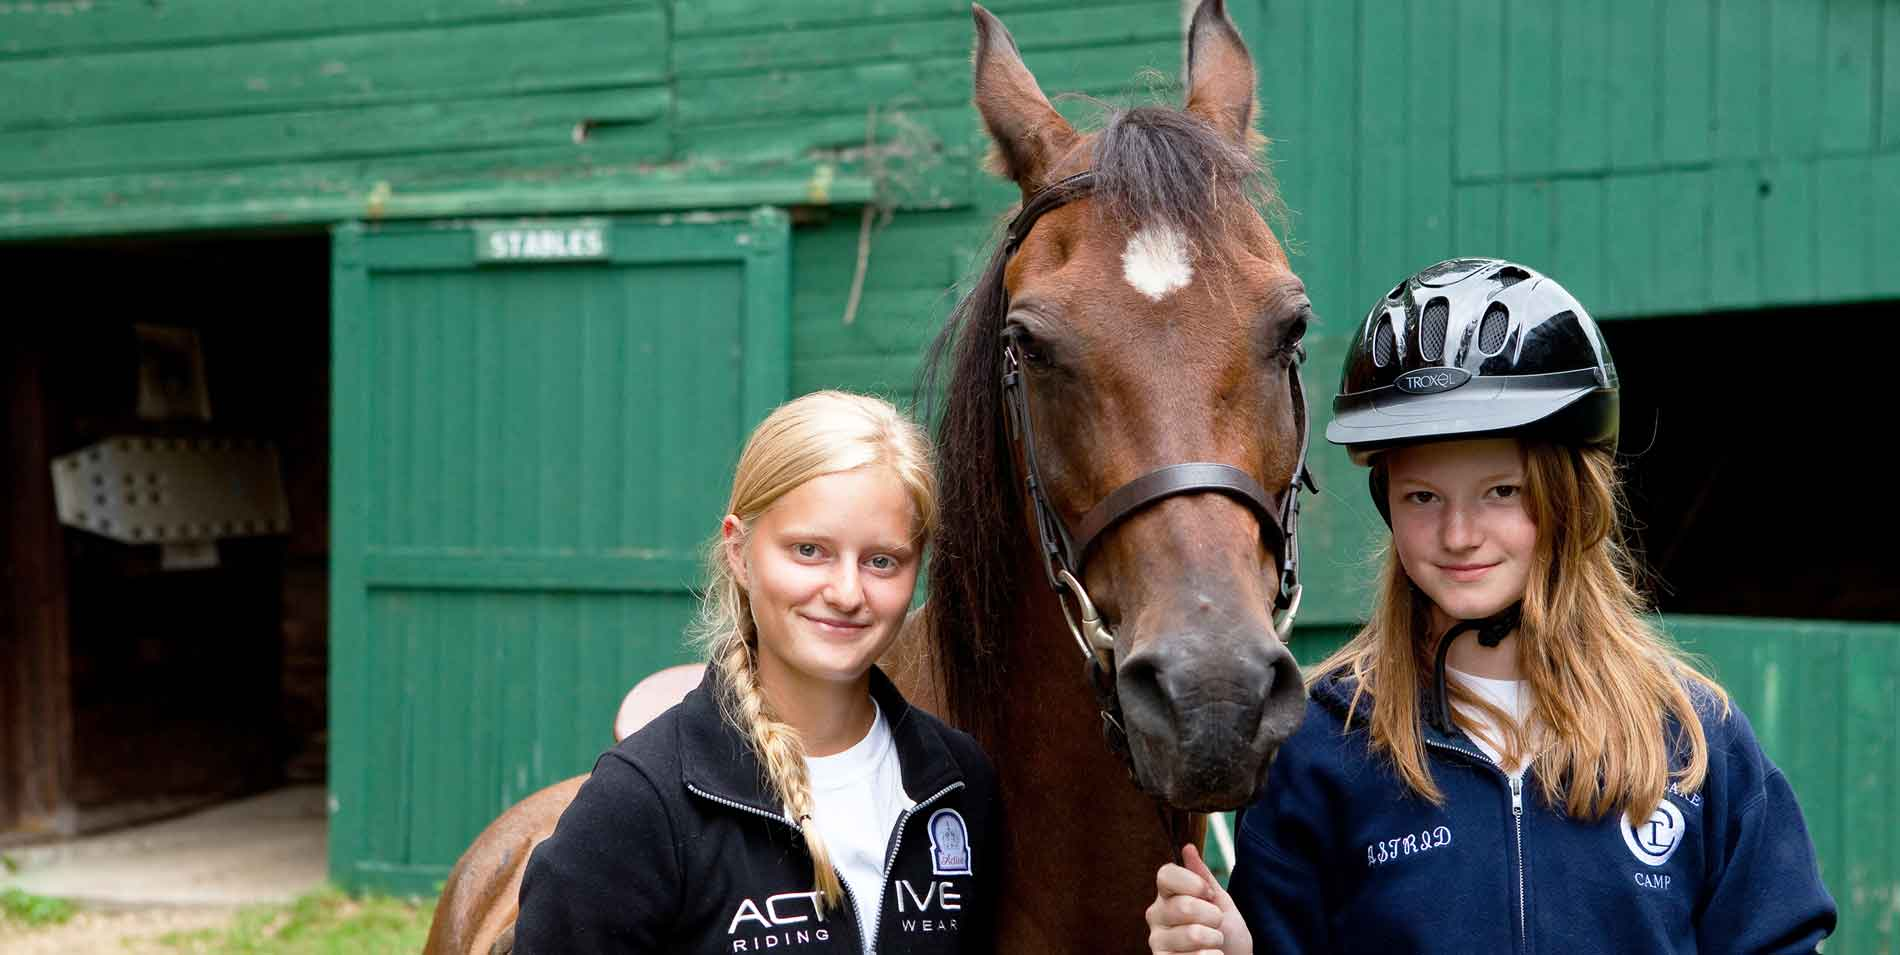 Horse Riding Girls